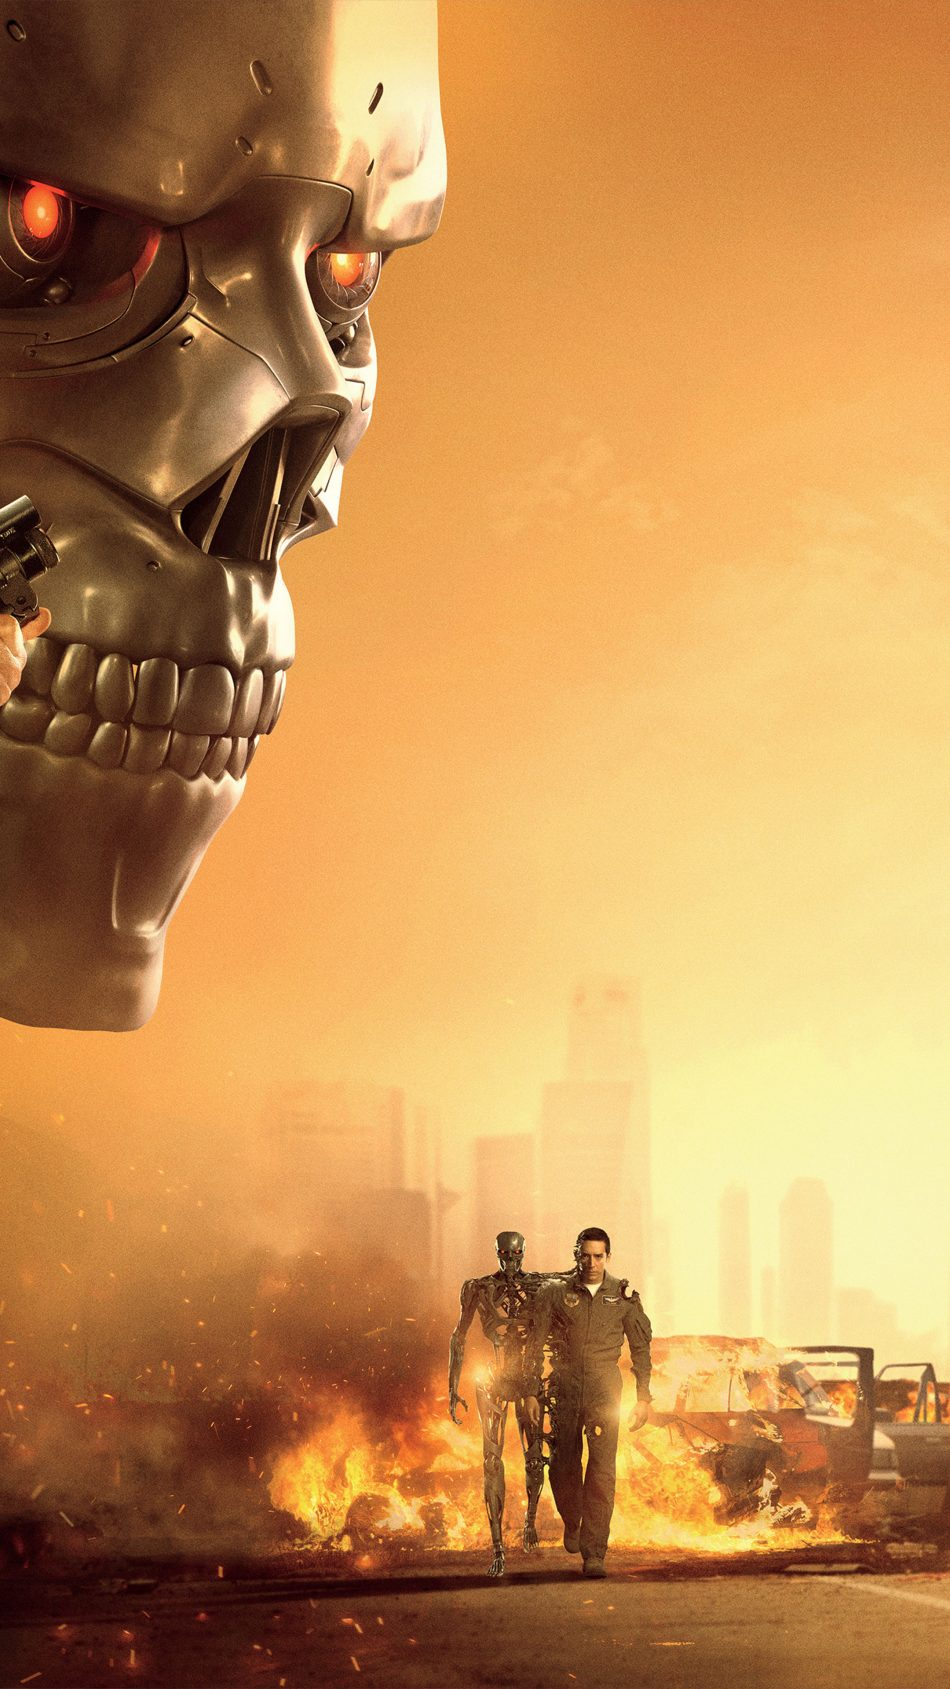 Terminator Dark Fate 2019 Free 4k Ultra Hd Mobile Wallpaper